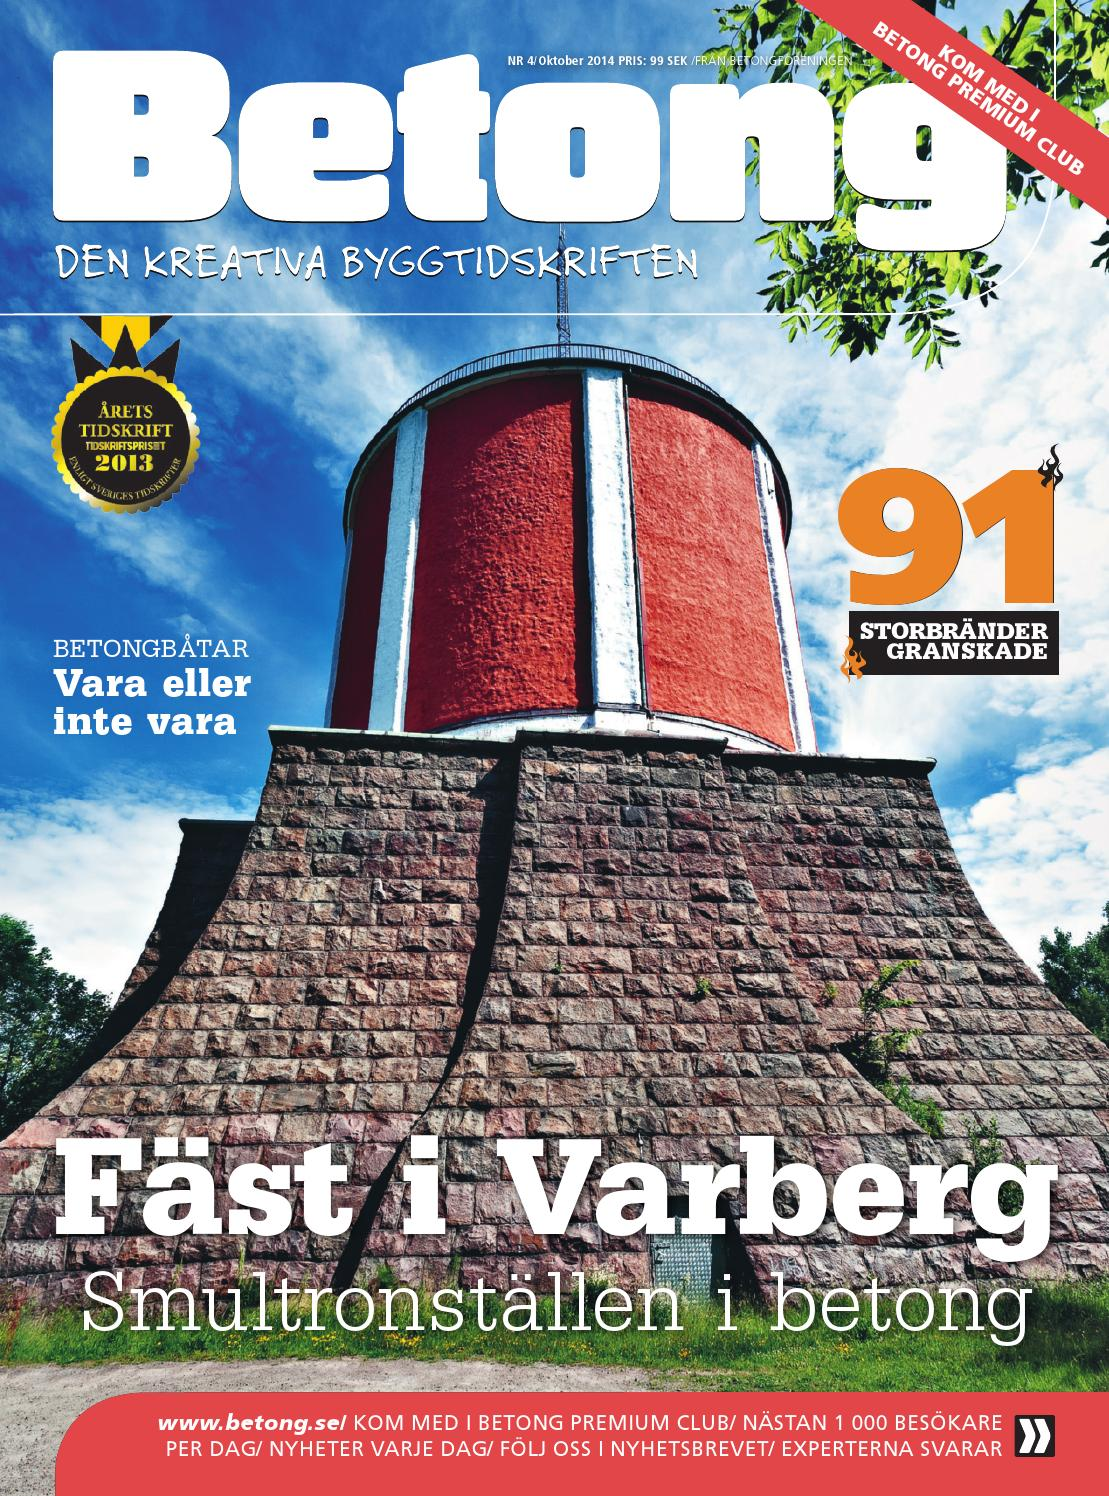 Tidskriften betong 1 2015 by tidskriften betong   issuu